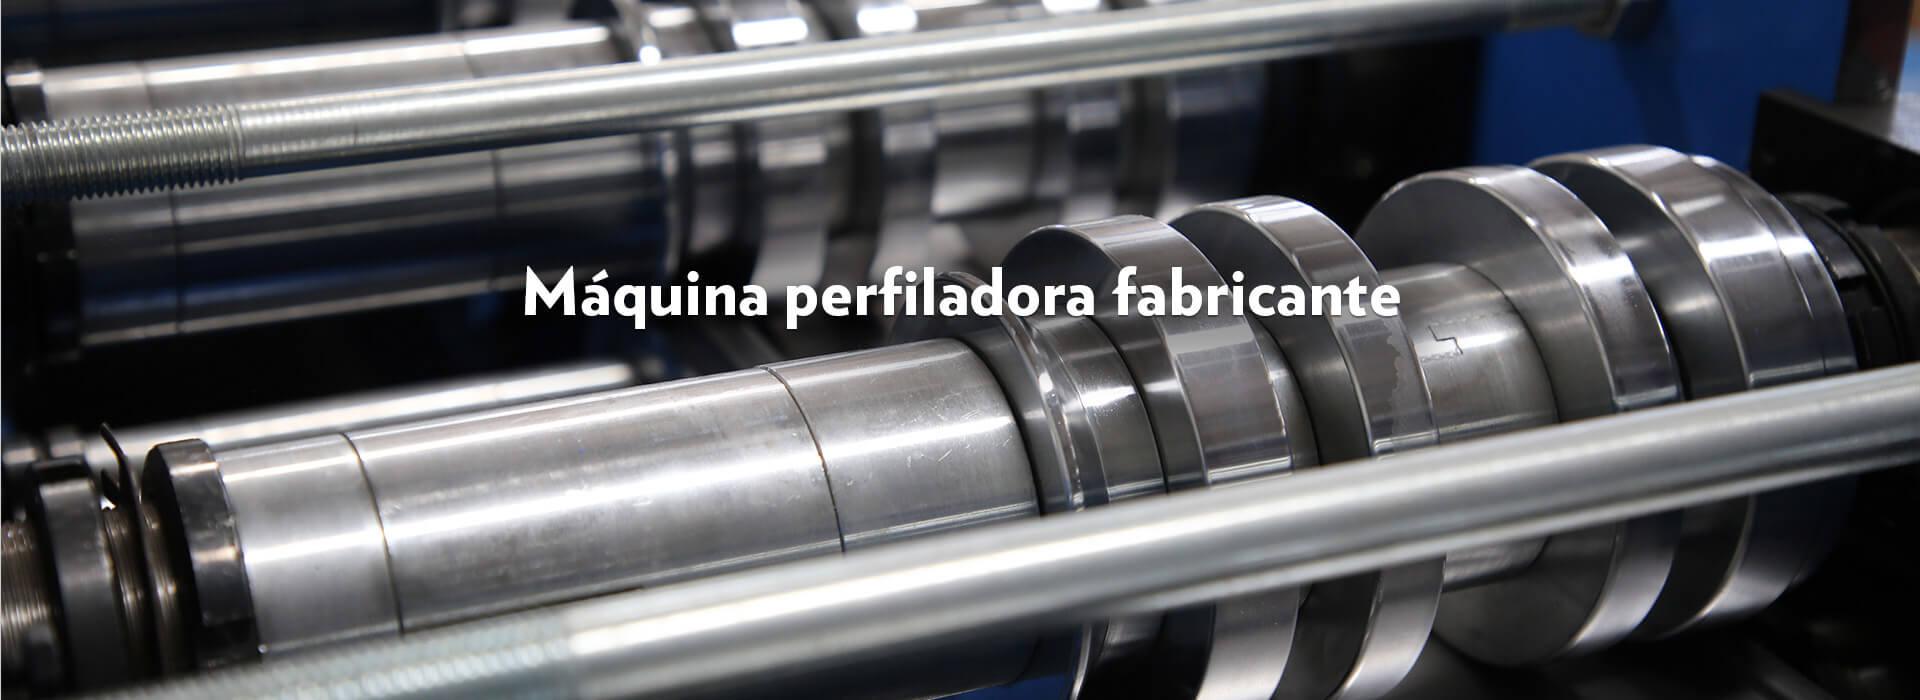 Máquina perfiladora fabricante